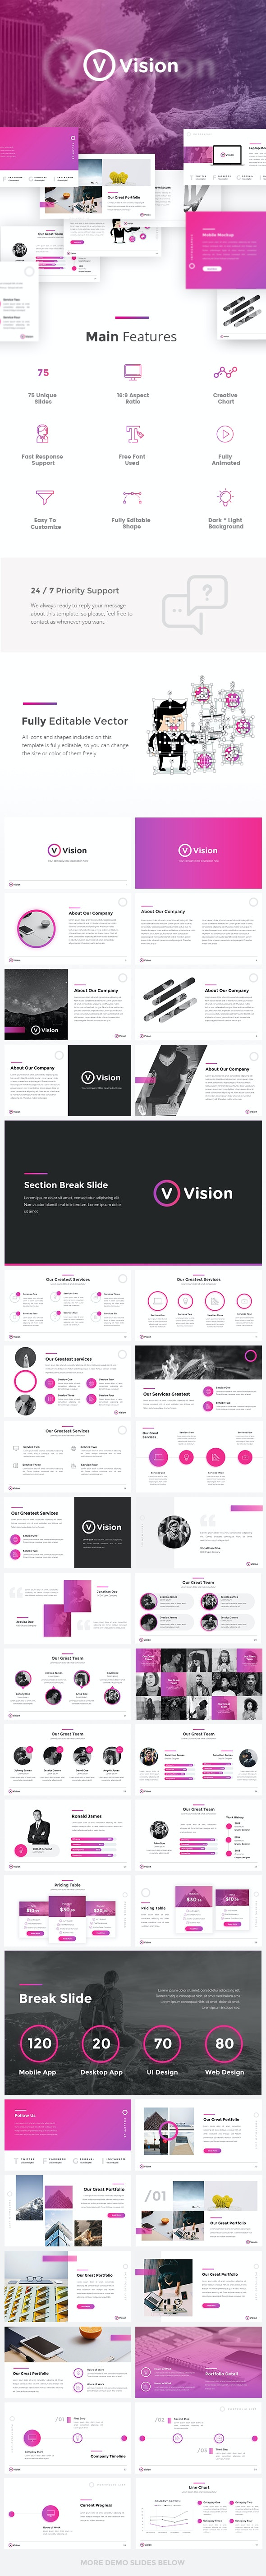 Vision - Creative Google Slides Template - Google Slides Presentation Templates